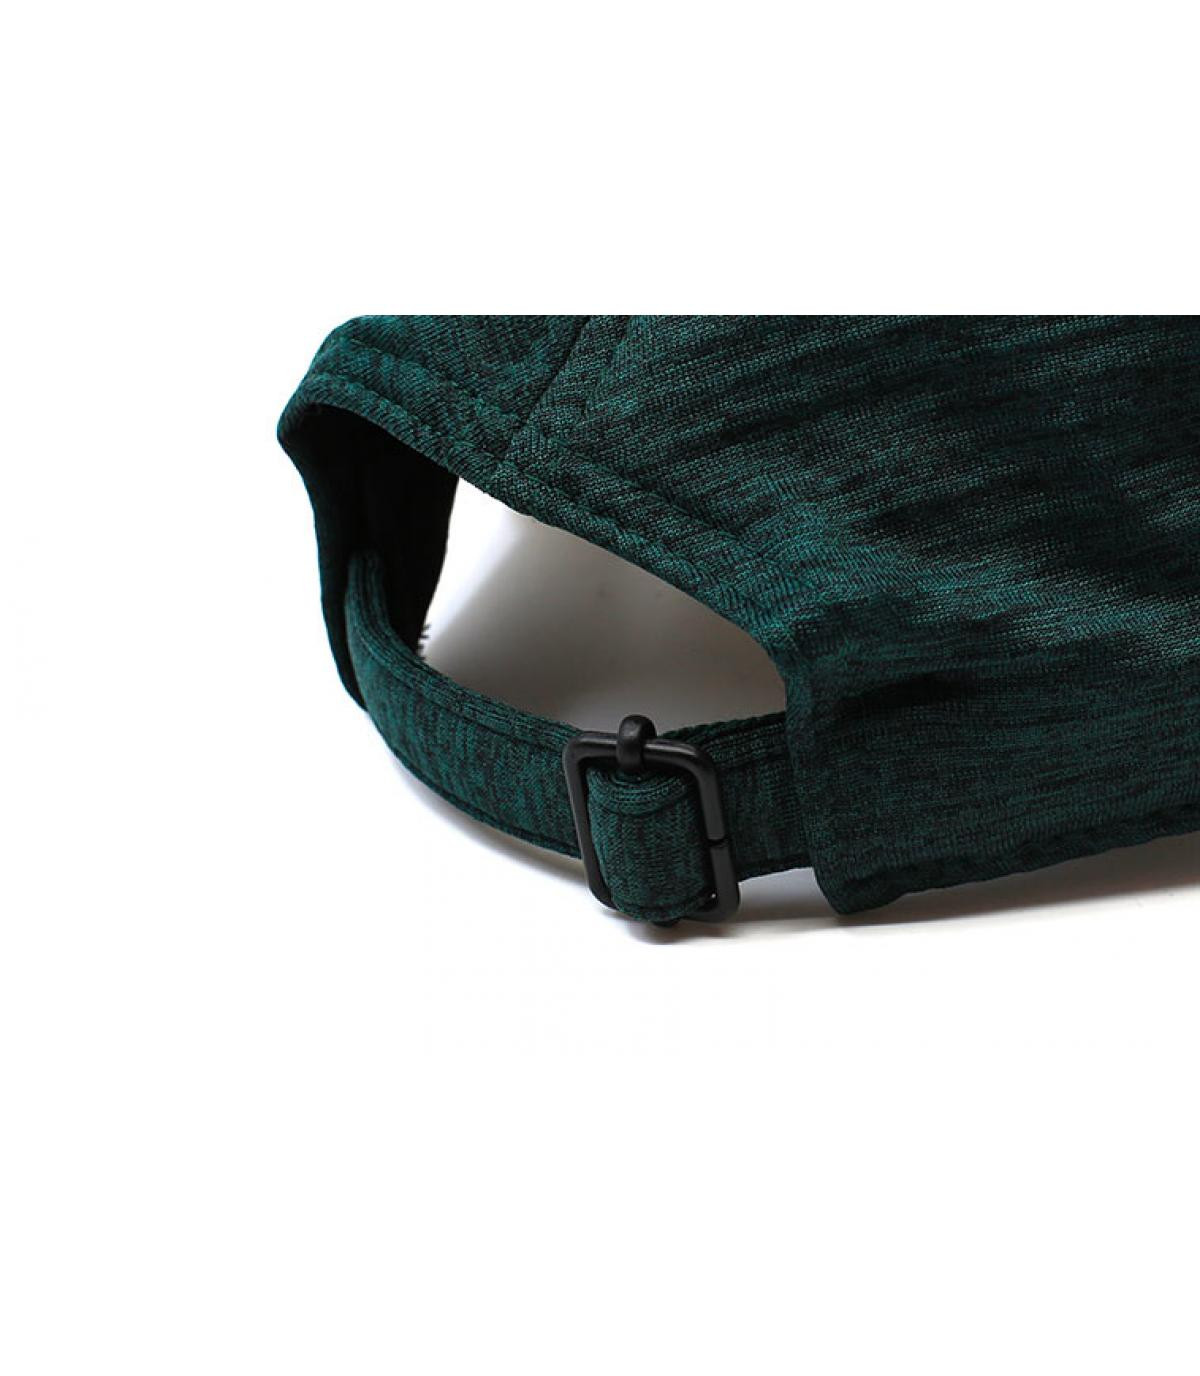 Dettagli Dry Switch NY 9Forty dark green - image 5